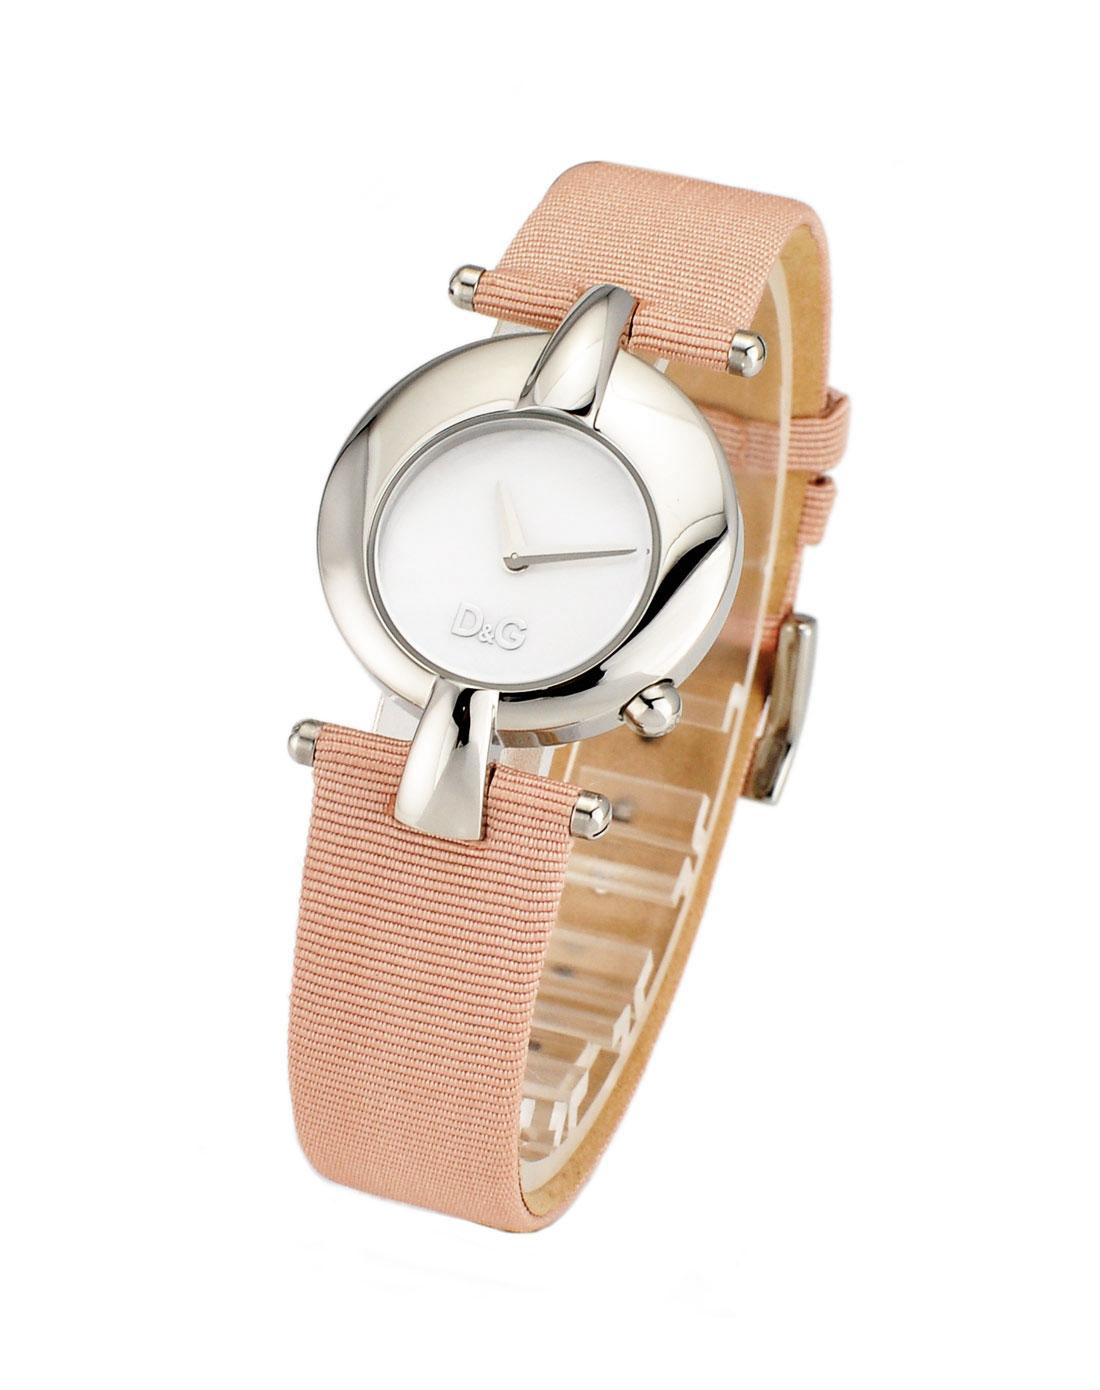 d&g粉色白盘时尚可爱女表dw0457